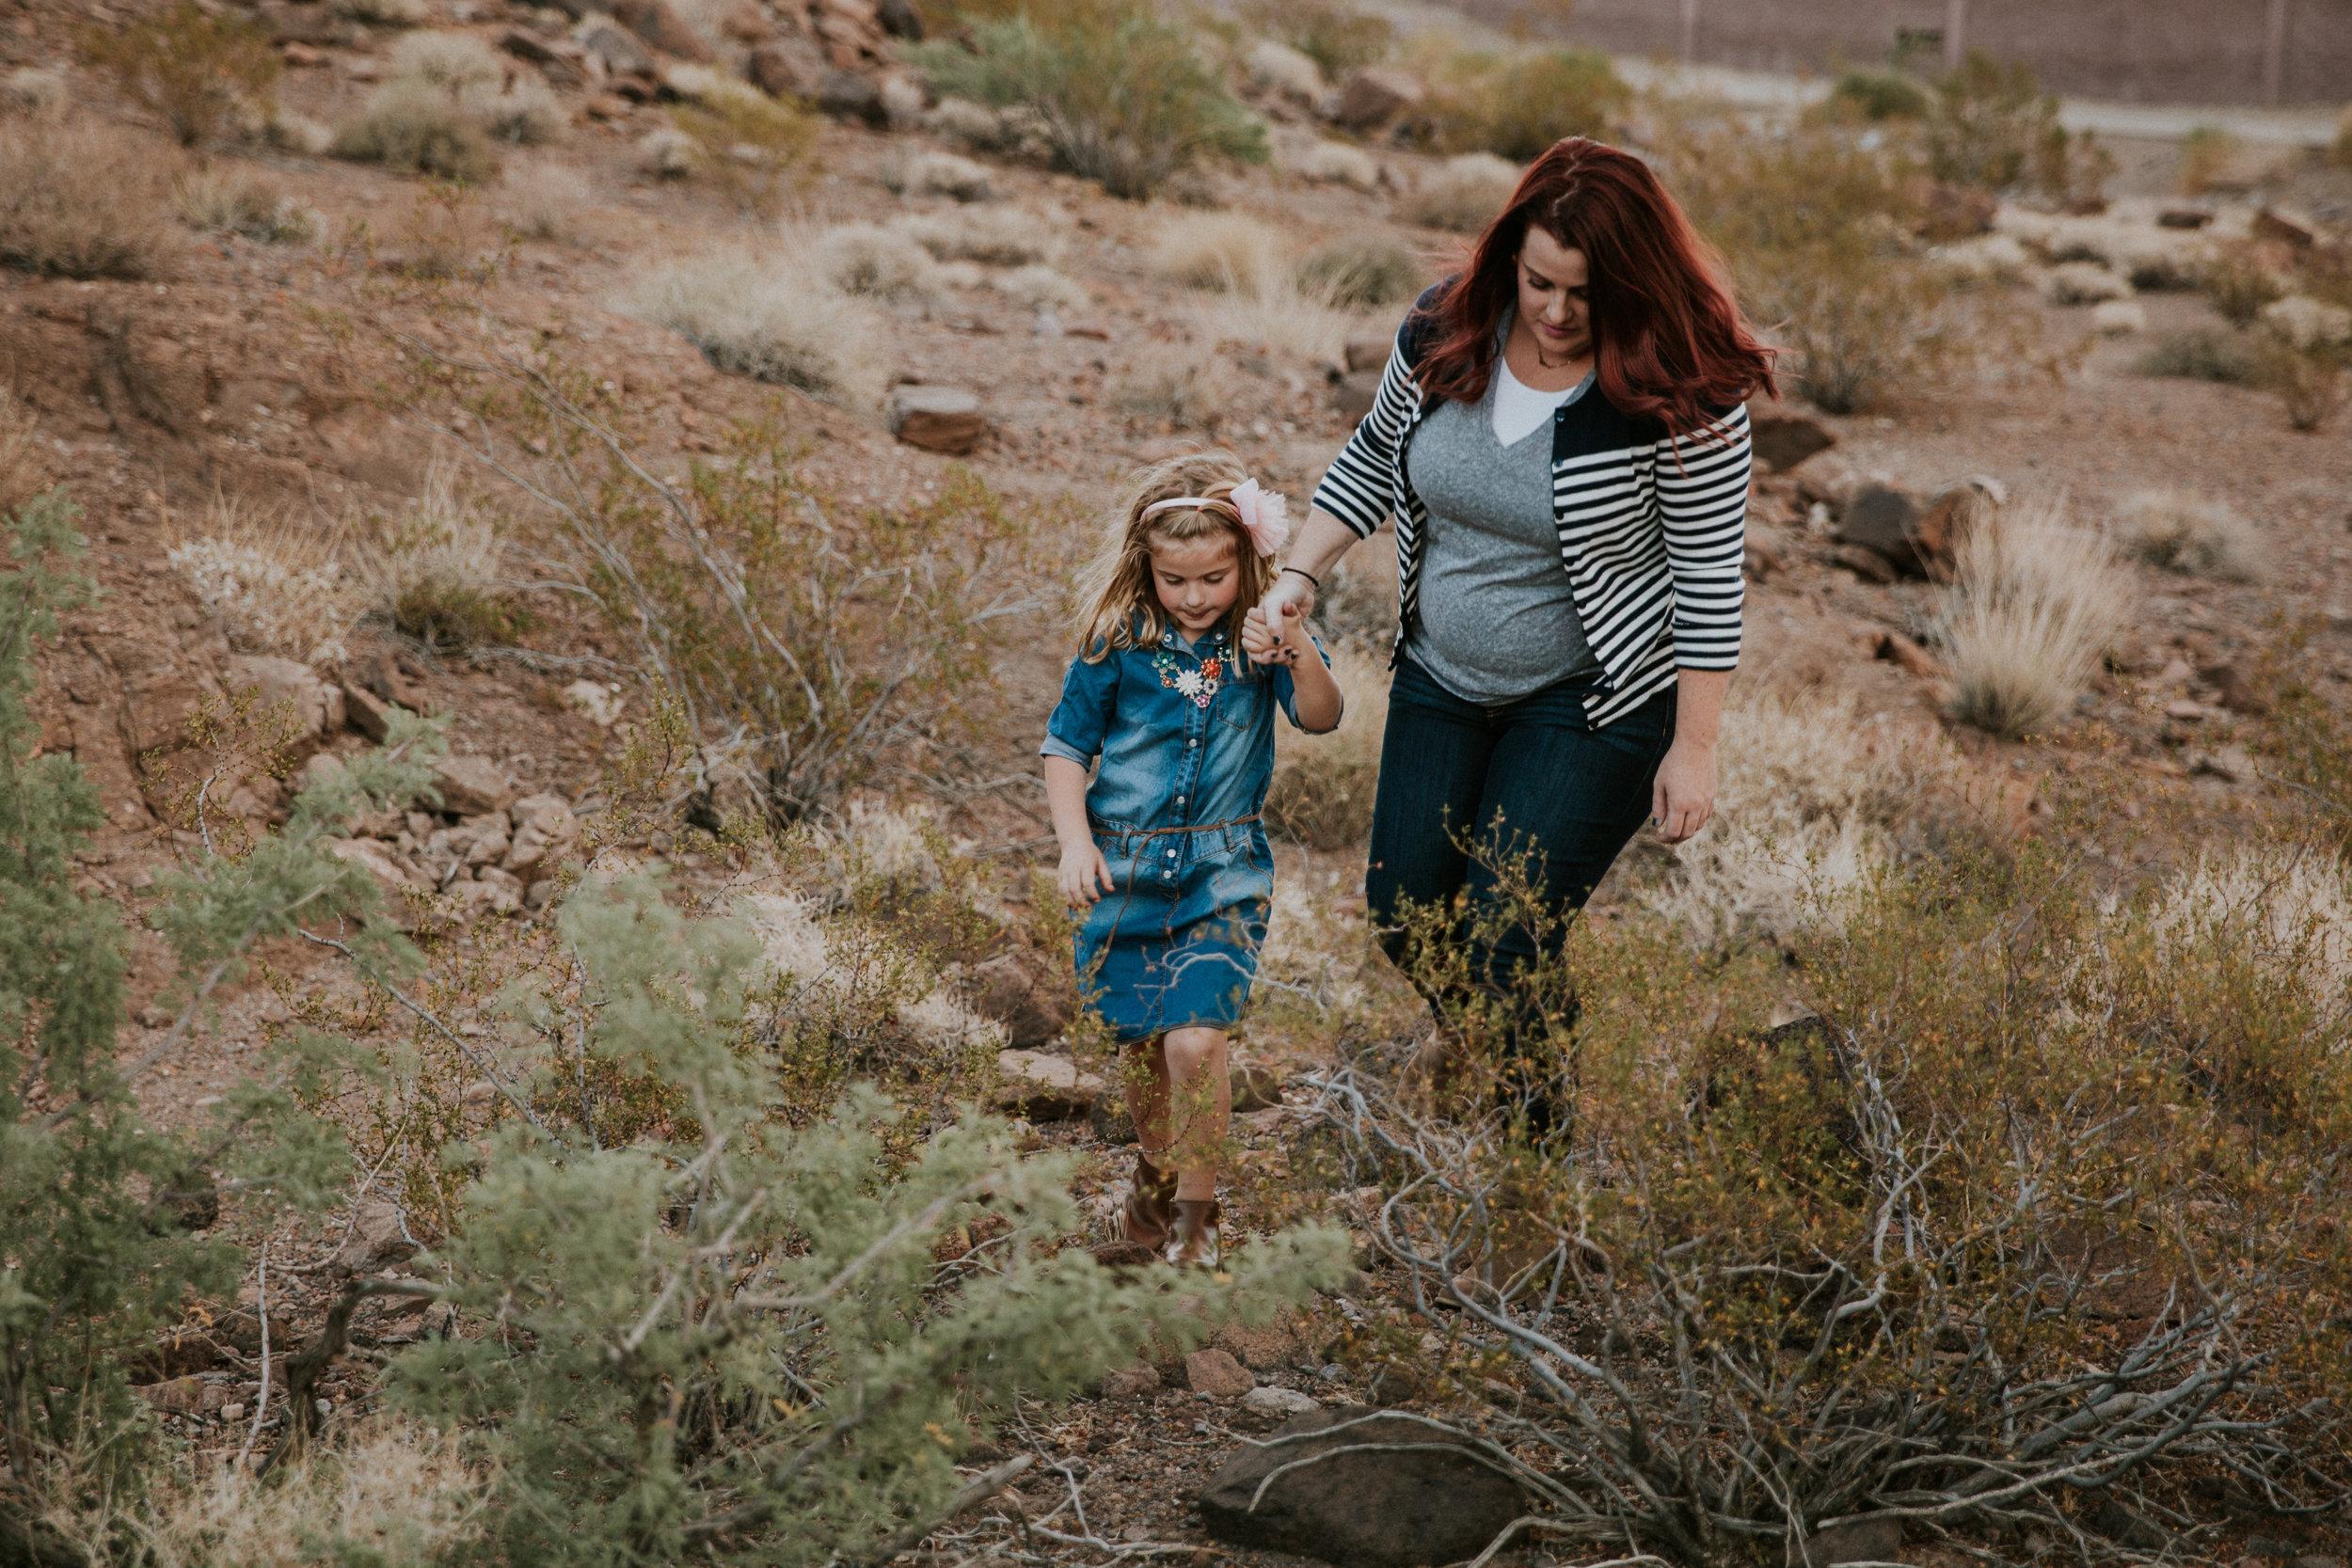 Lifestyle Family Photography - Las Vegas Photographer - Desert Landscape - Henderson, NV - Mother and Daughter